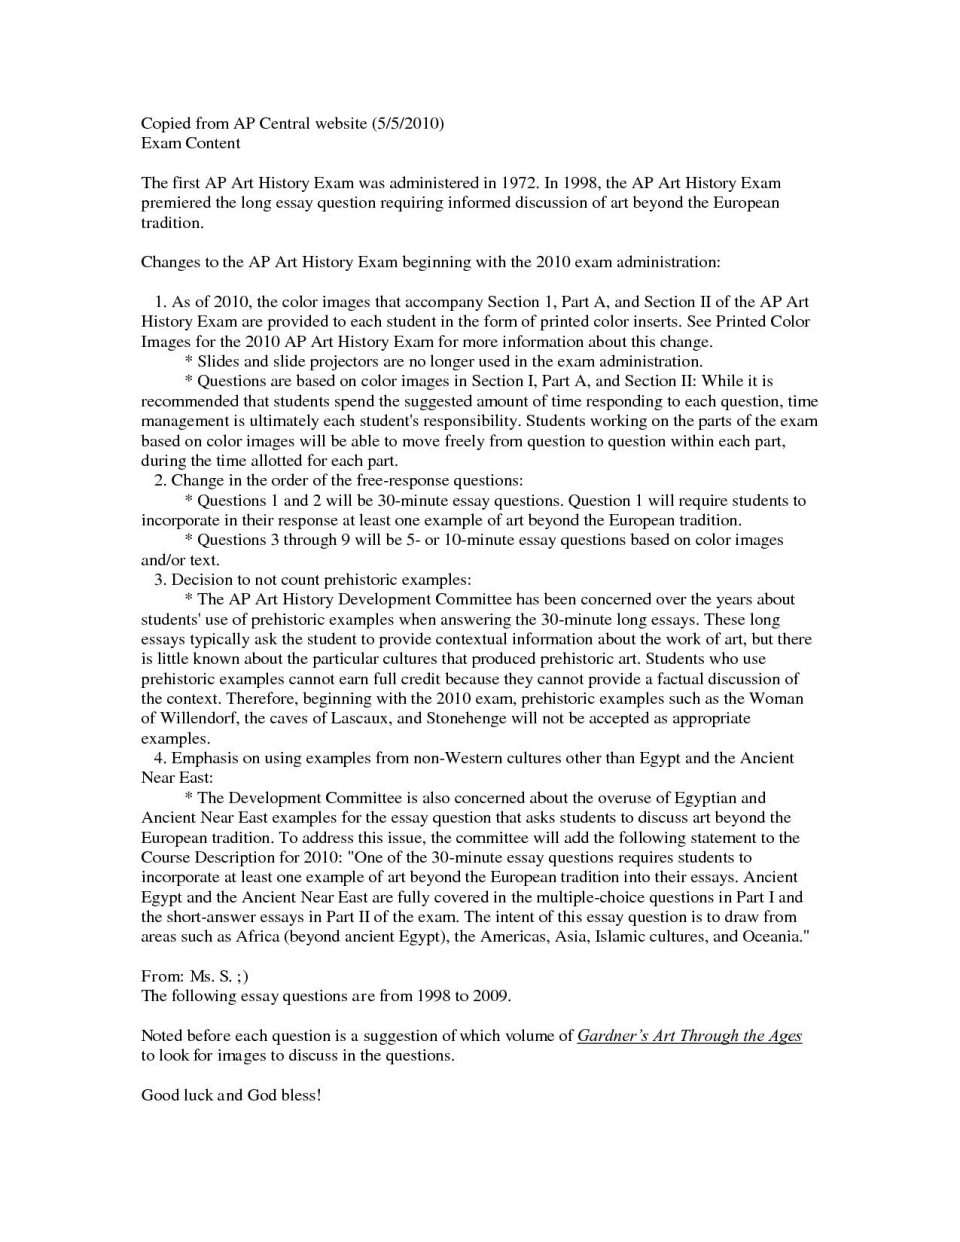 005 Wonderful Essay Paper Picture  Upsc 2019 In Hindi Pdf Format Cs Past 2018960